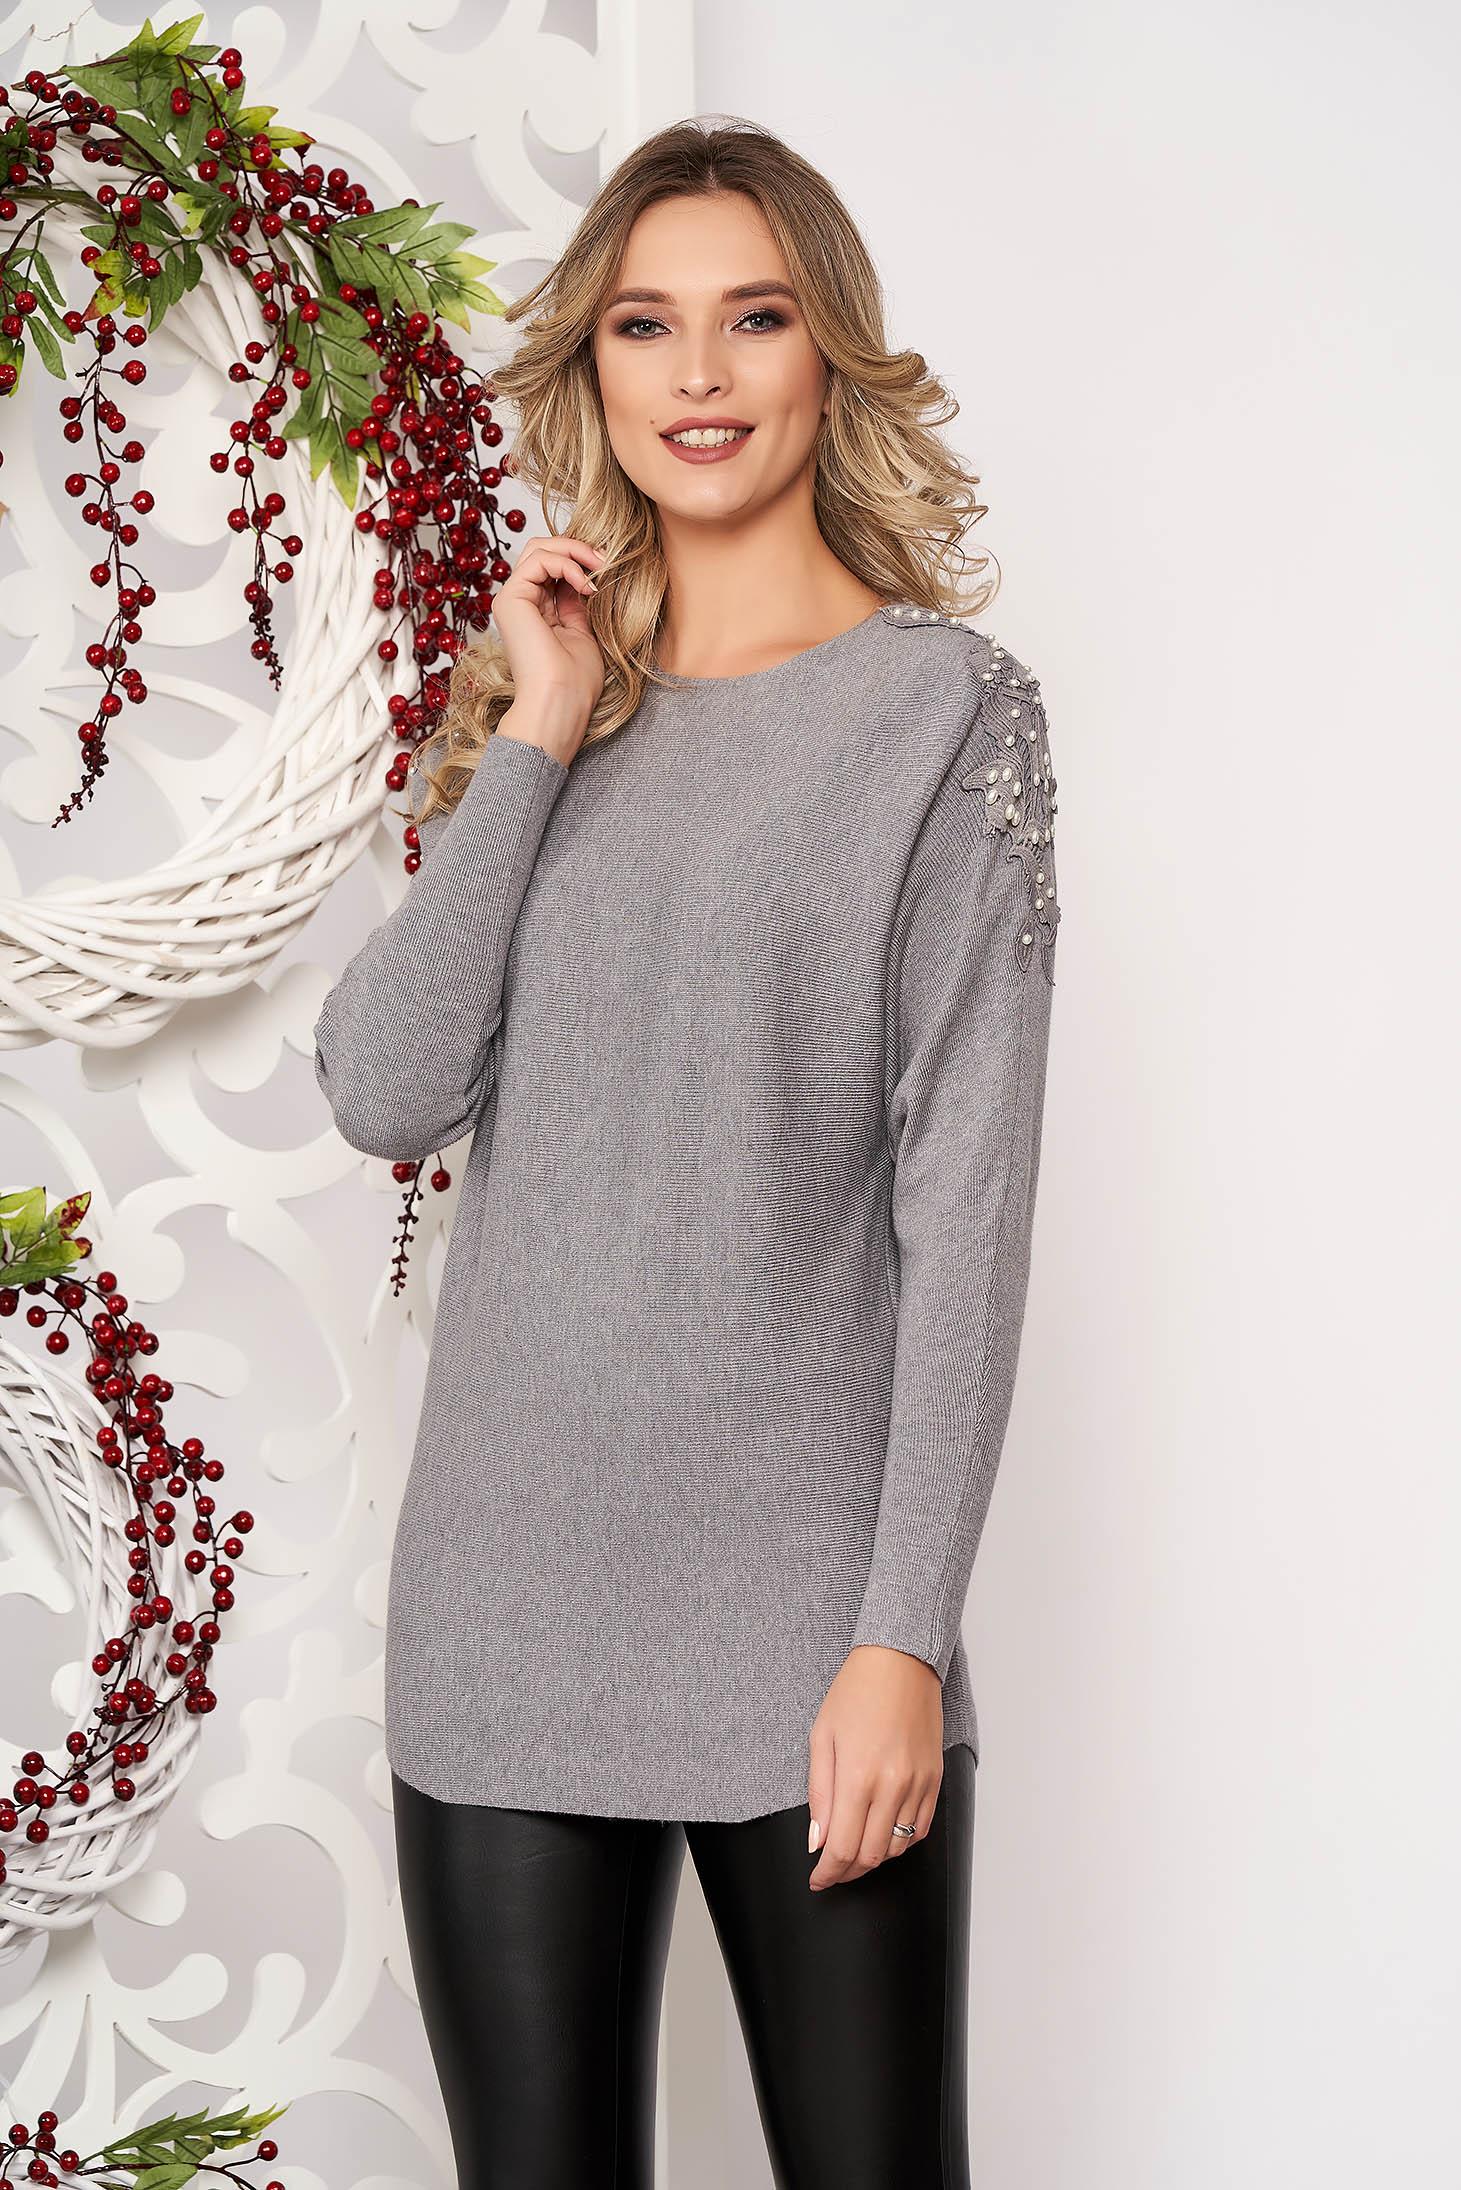 Pulover SunShine gri cu croi larg scurt din material tricotat cu aplicatii de dantela cu maneci lungi